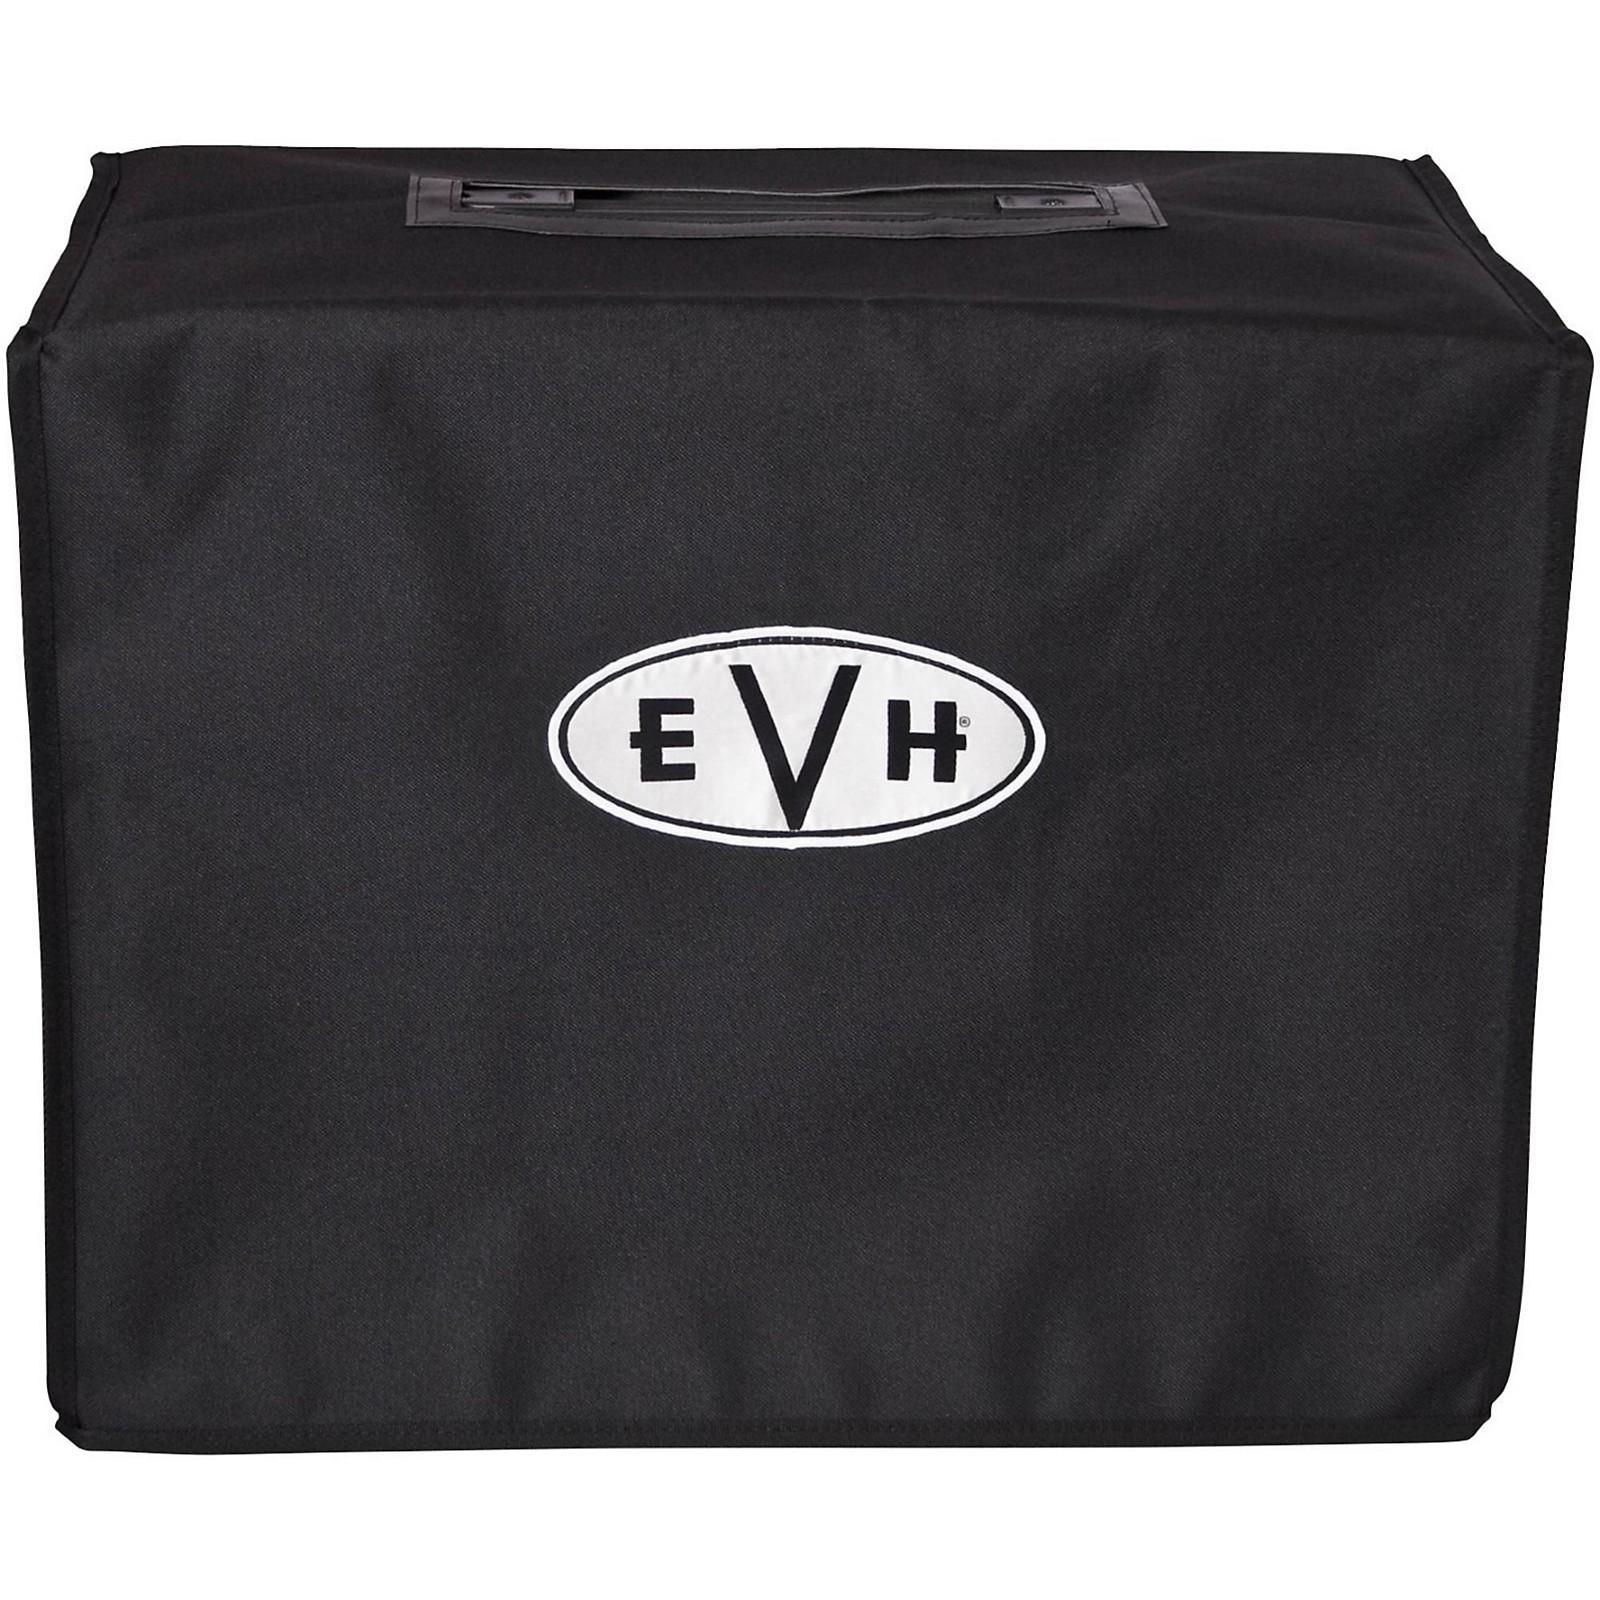 EVH Cover for 1x12 Guitar Speaker Cabinet